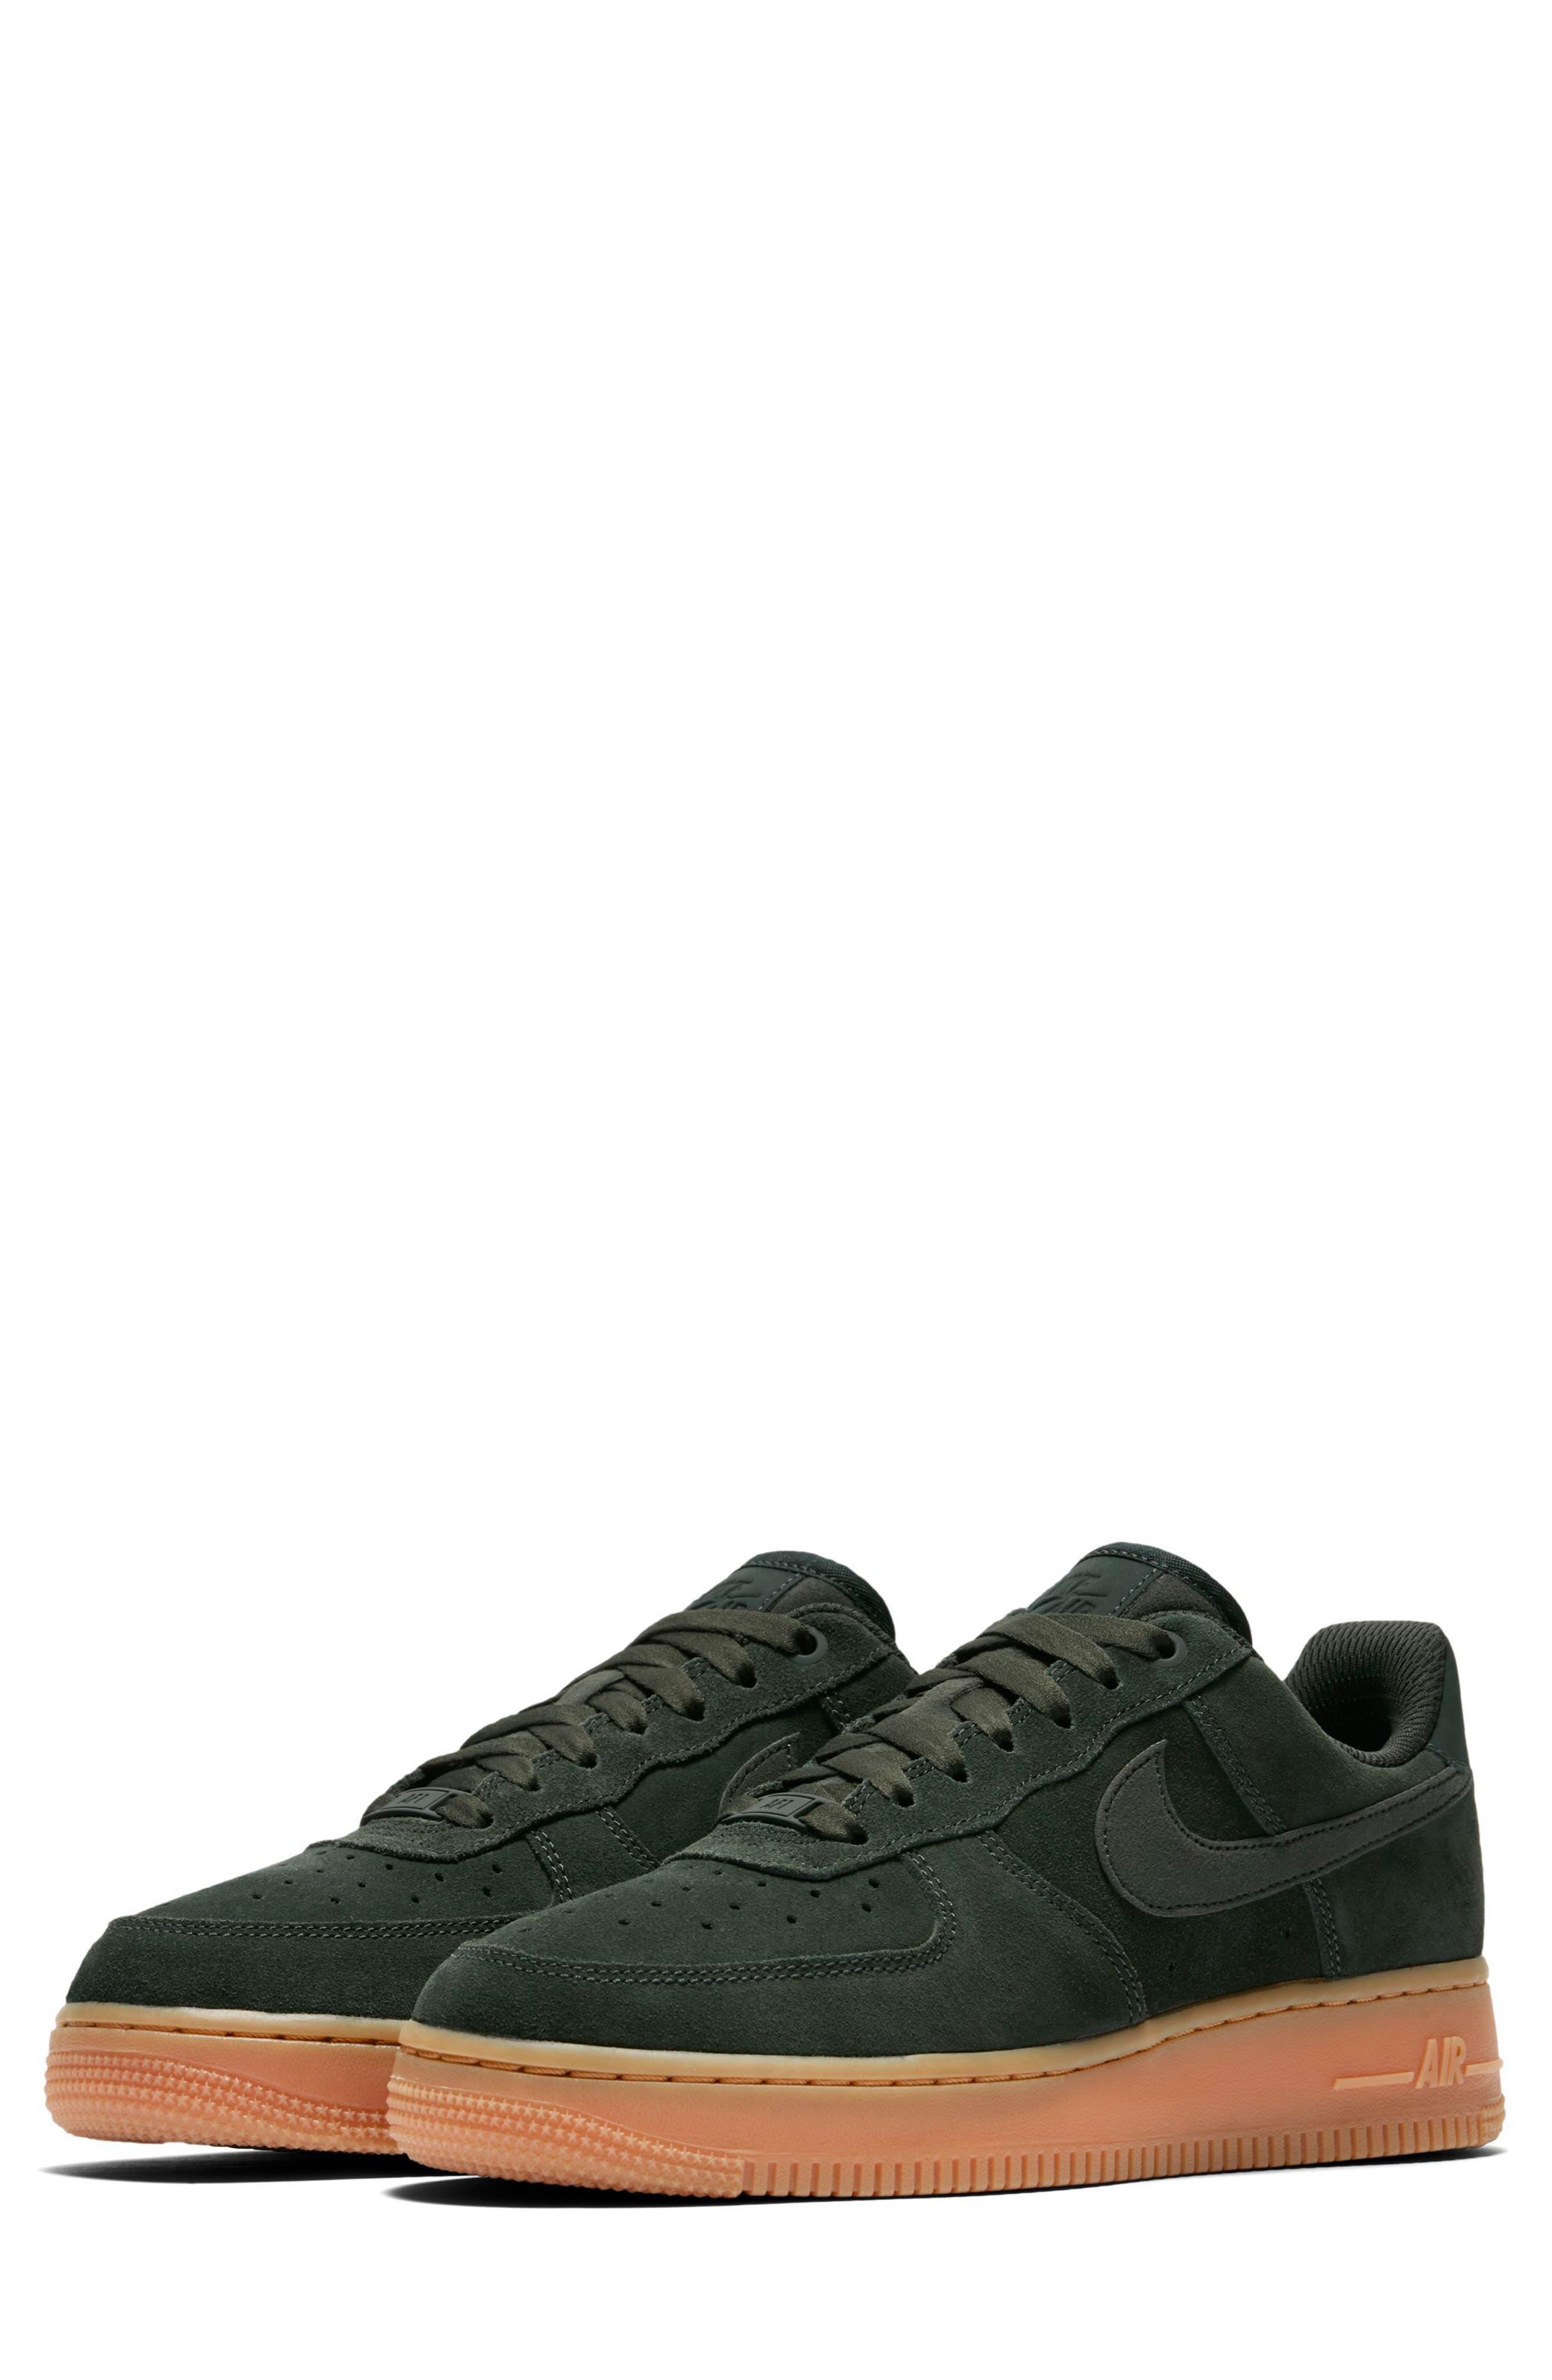 Air Force 1 '07 SE Sneaker,                             Main thumbnail 1, color,                             Outdoor Green/ Outdoor Green